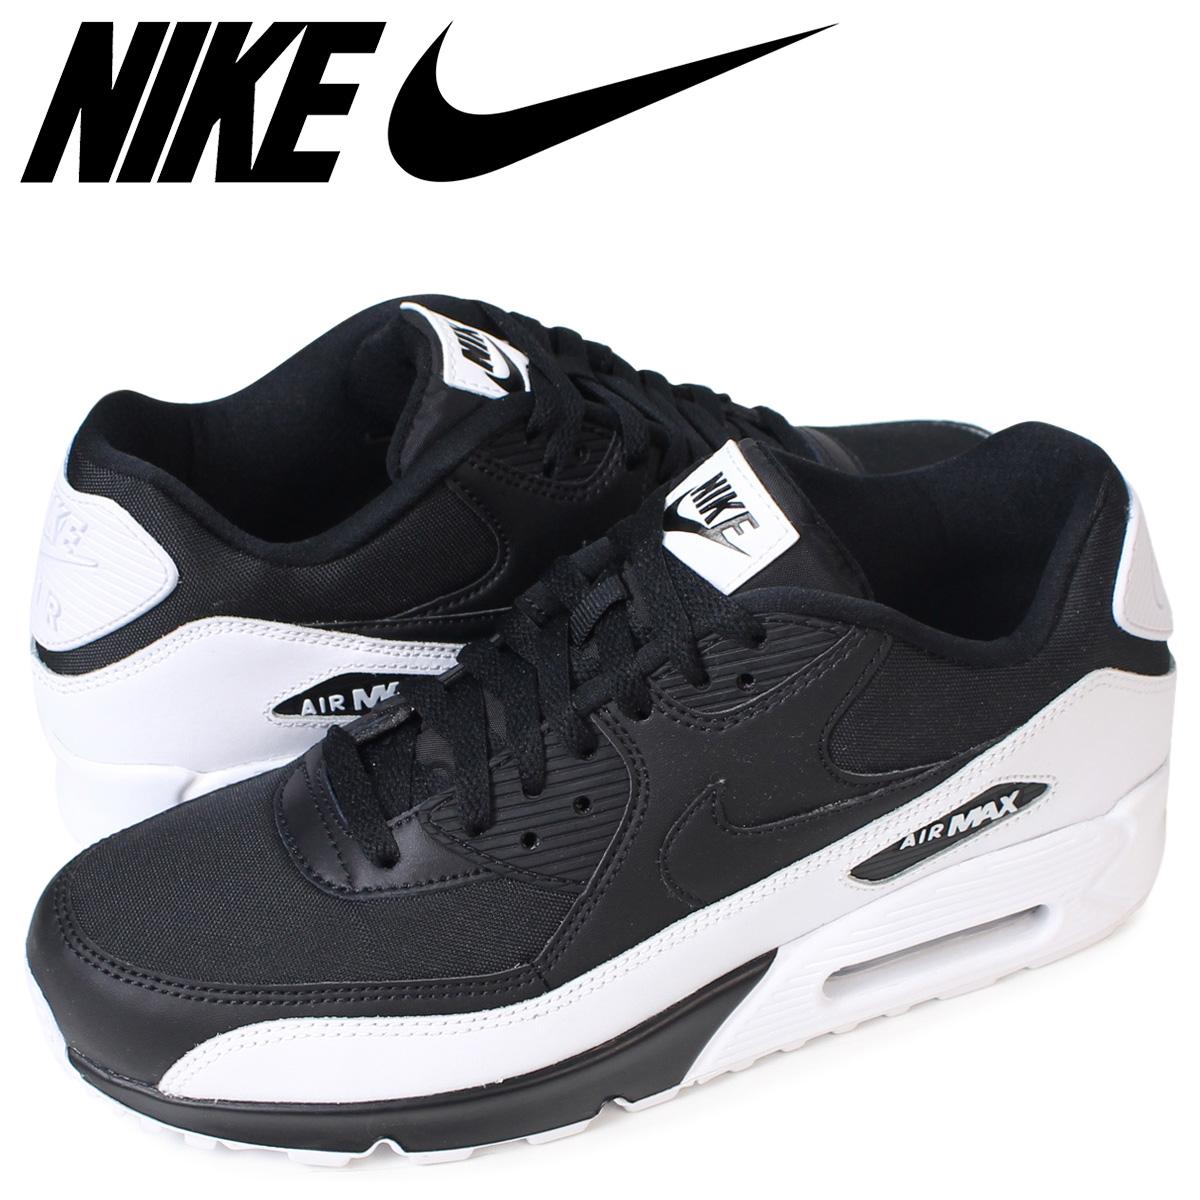 119bada98ea3 Whats up Sports  Nike NIKE Air Max 90 essential sneakers AIR MAX 90 ...